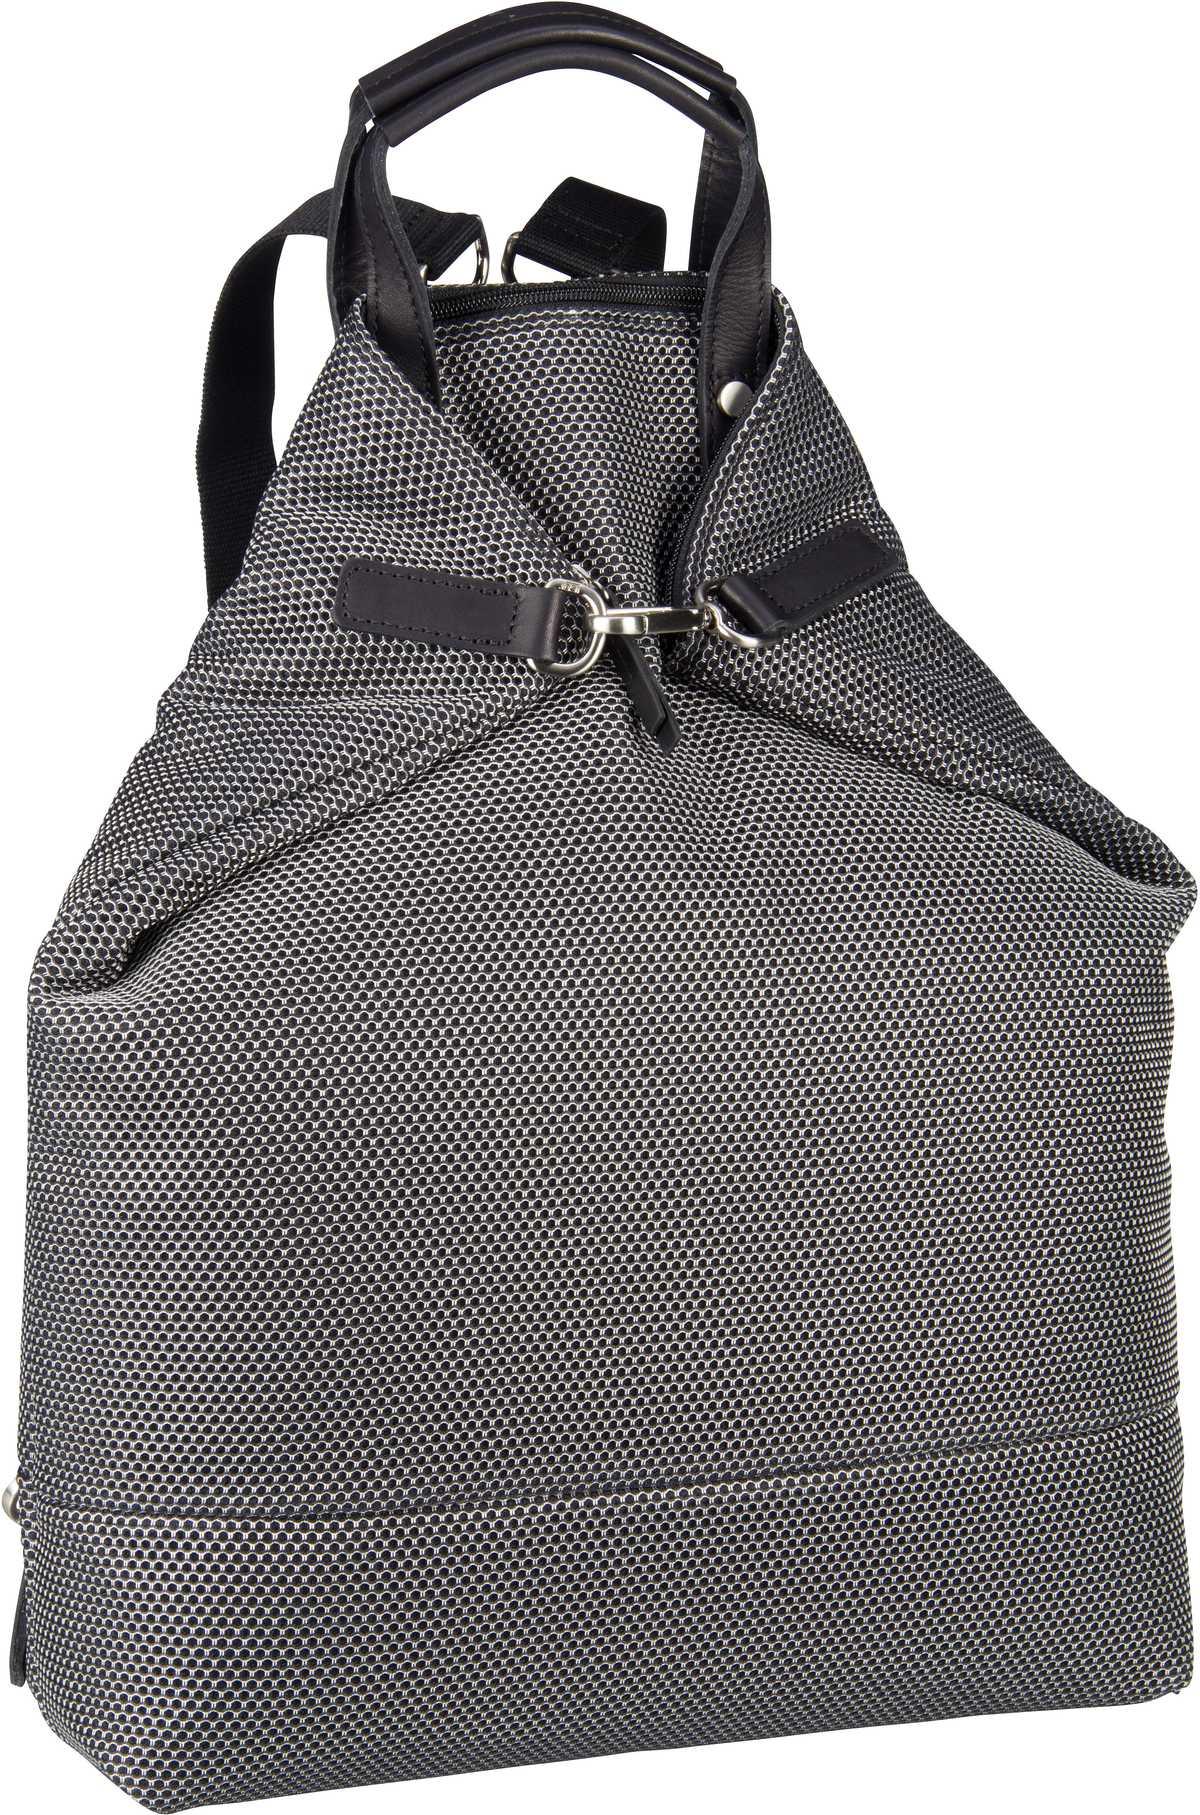 Rucksack / Daypack Mesh 6170 X-Change 3in1 Bag M Silver